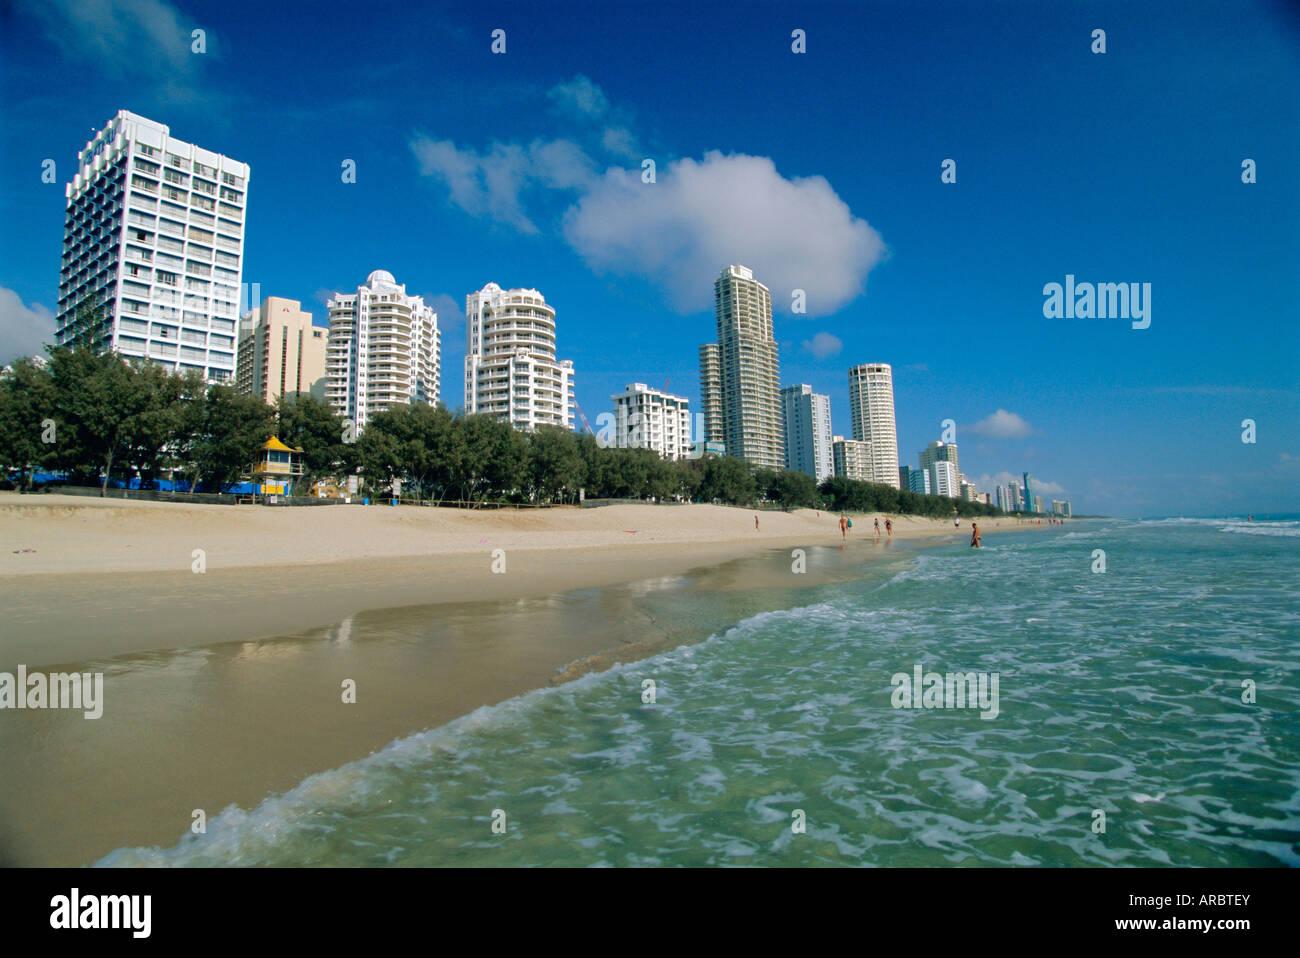 Surfers Paradise beach, Gold Coast, Queensland, Australia - Stock Image